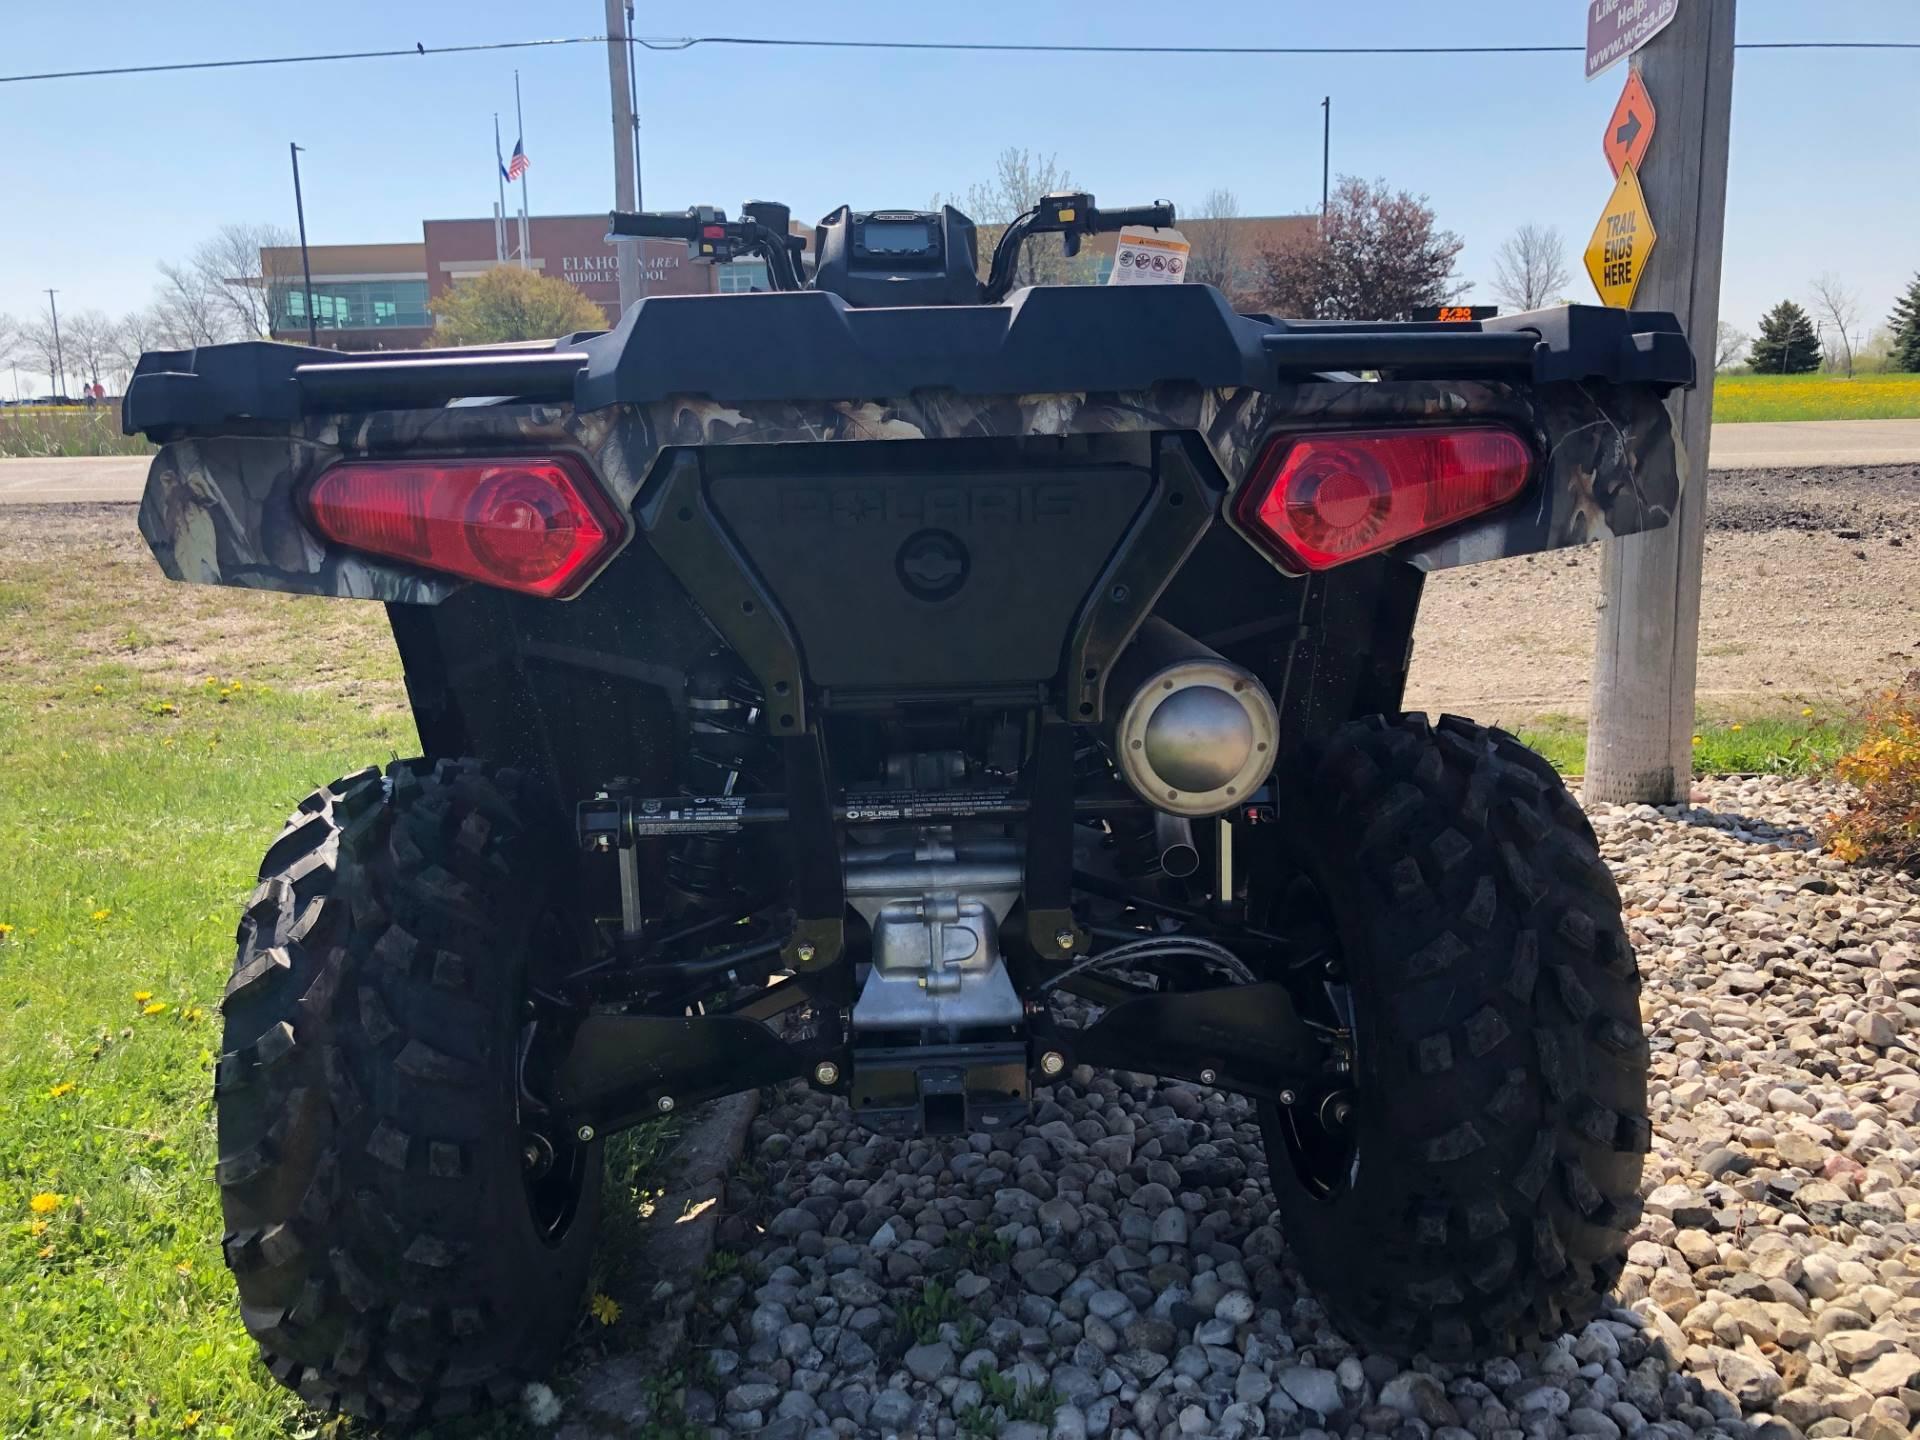 2019 Polaris Sportsman 570 Camo in Elkhorn, Wisconsin